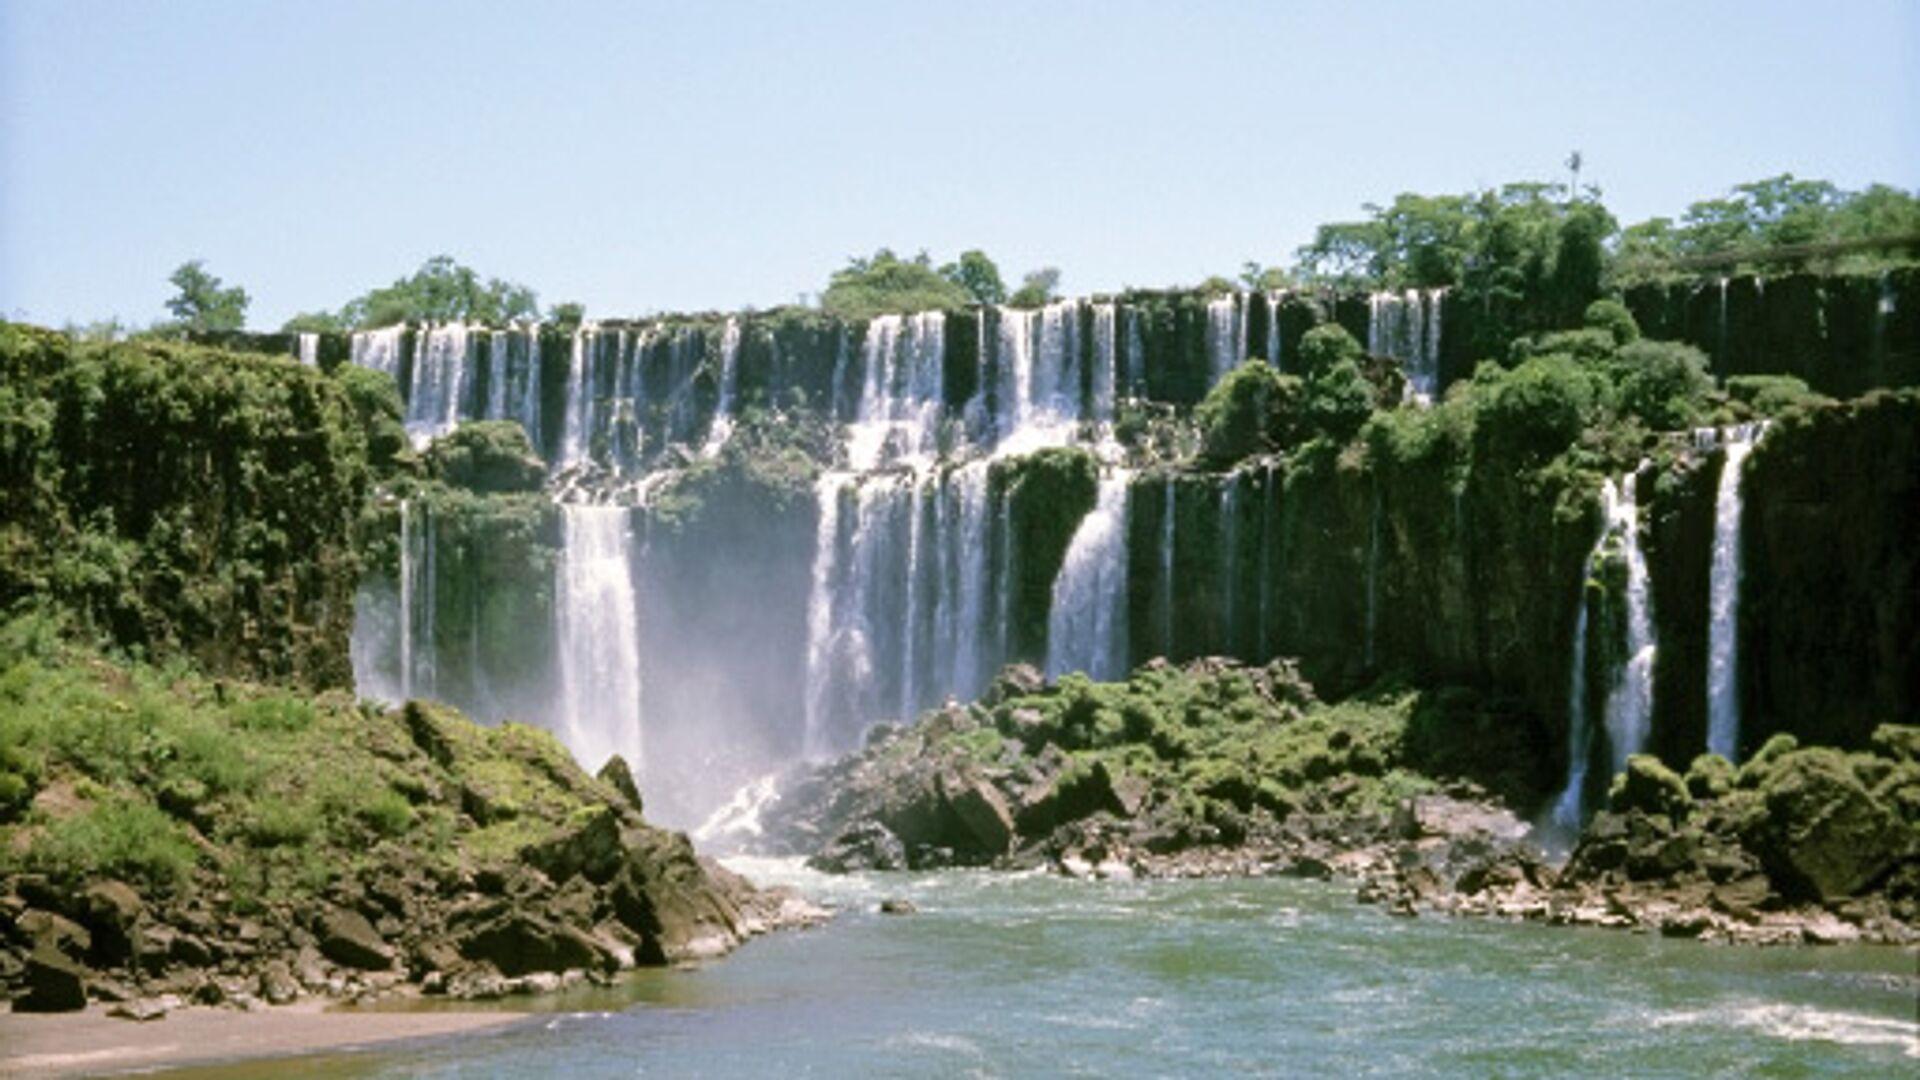 Водопады Игуасу на границе Аргентины и Бразилии - РИА Новости, 1920, 22.12.2020